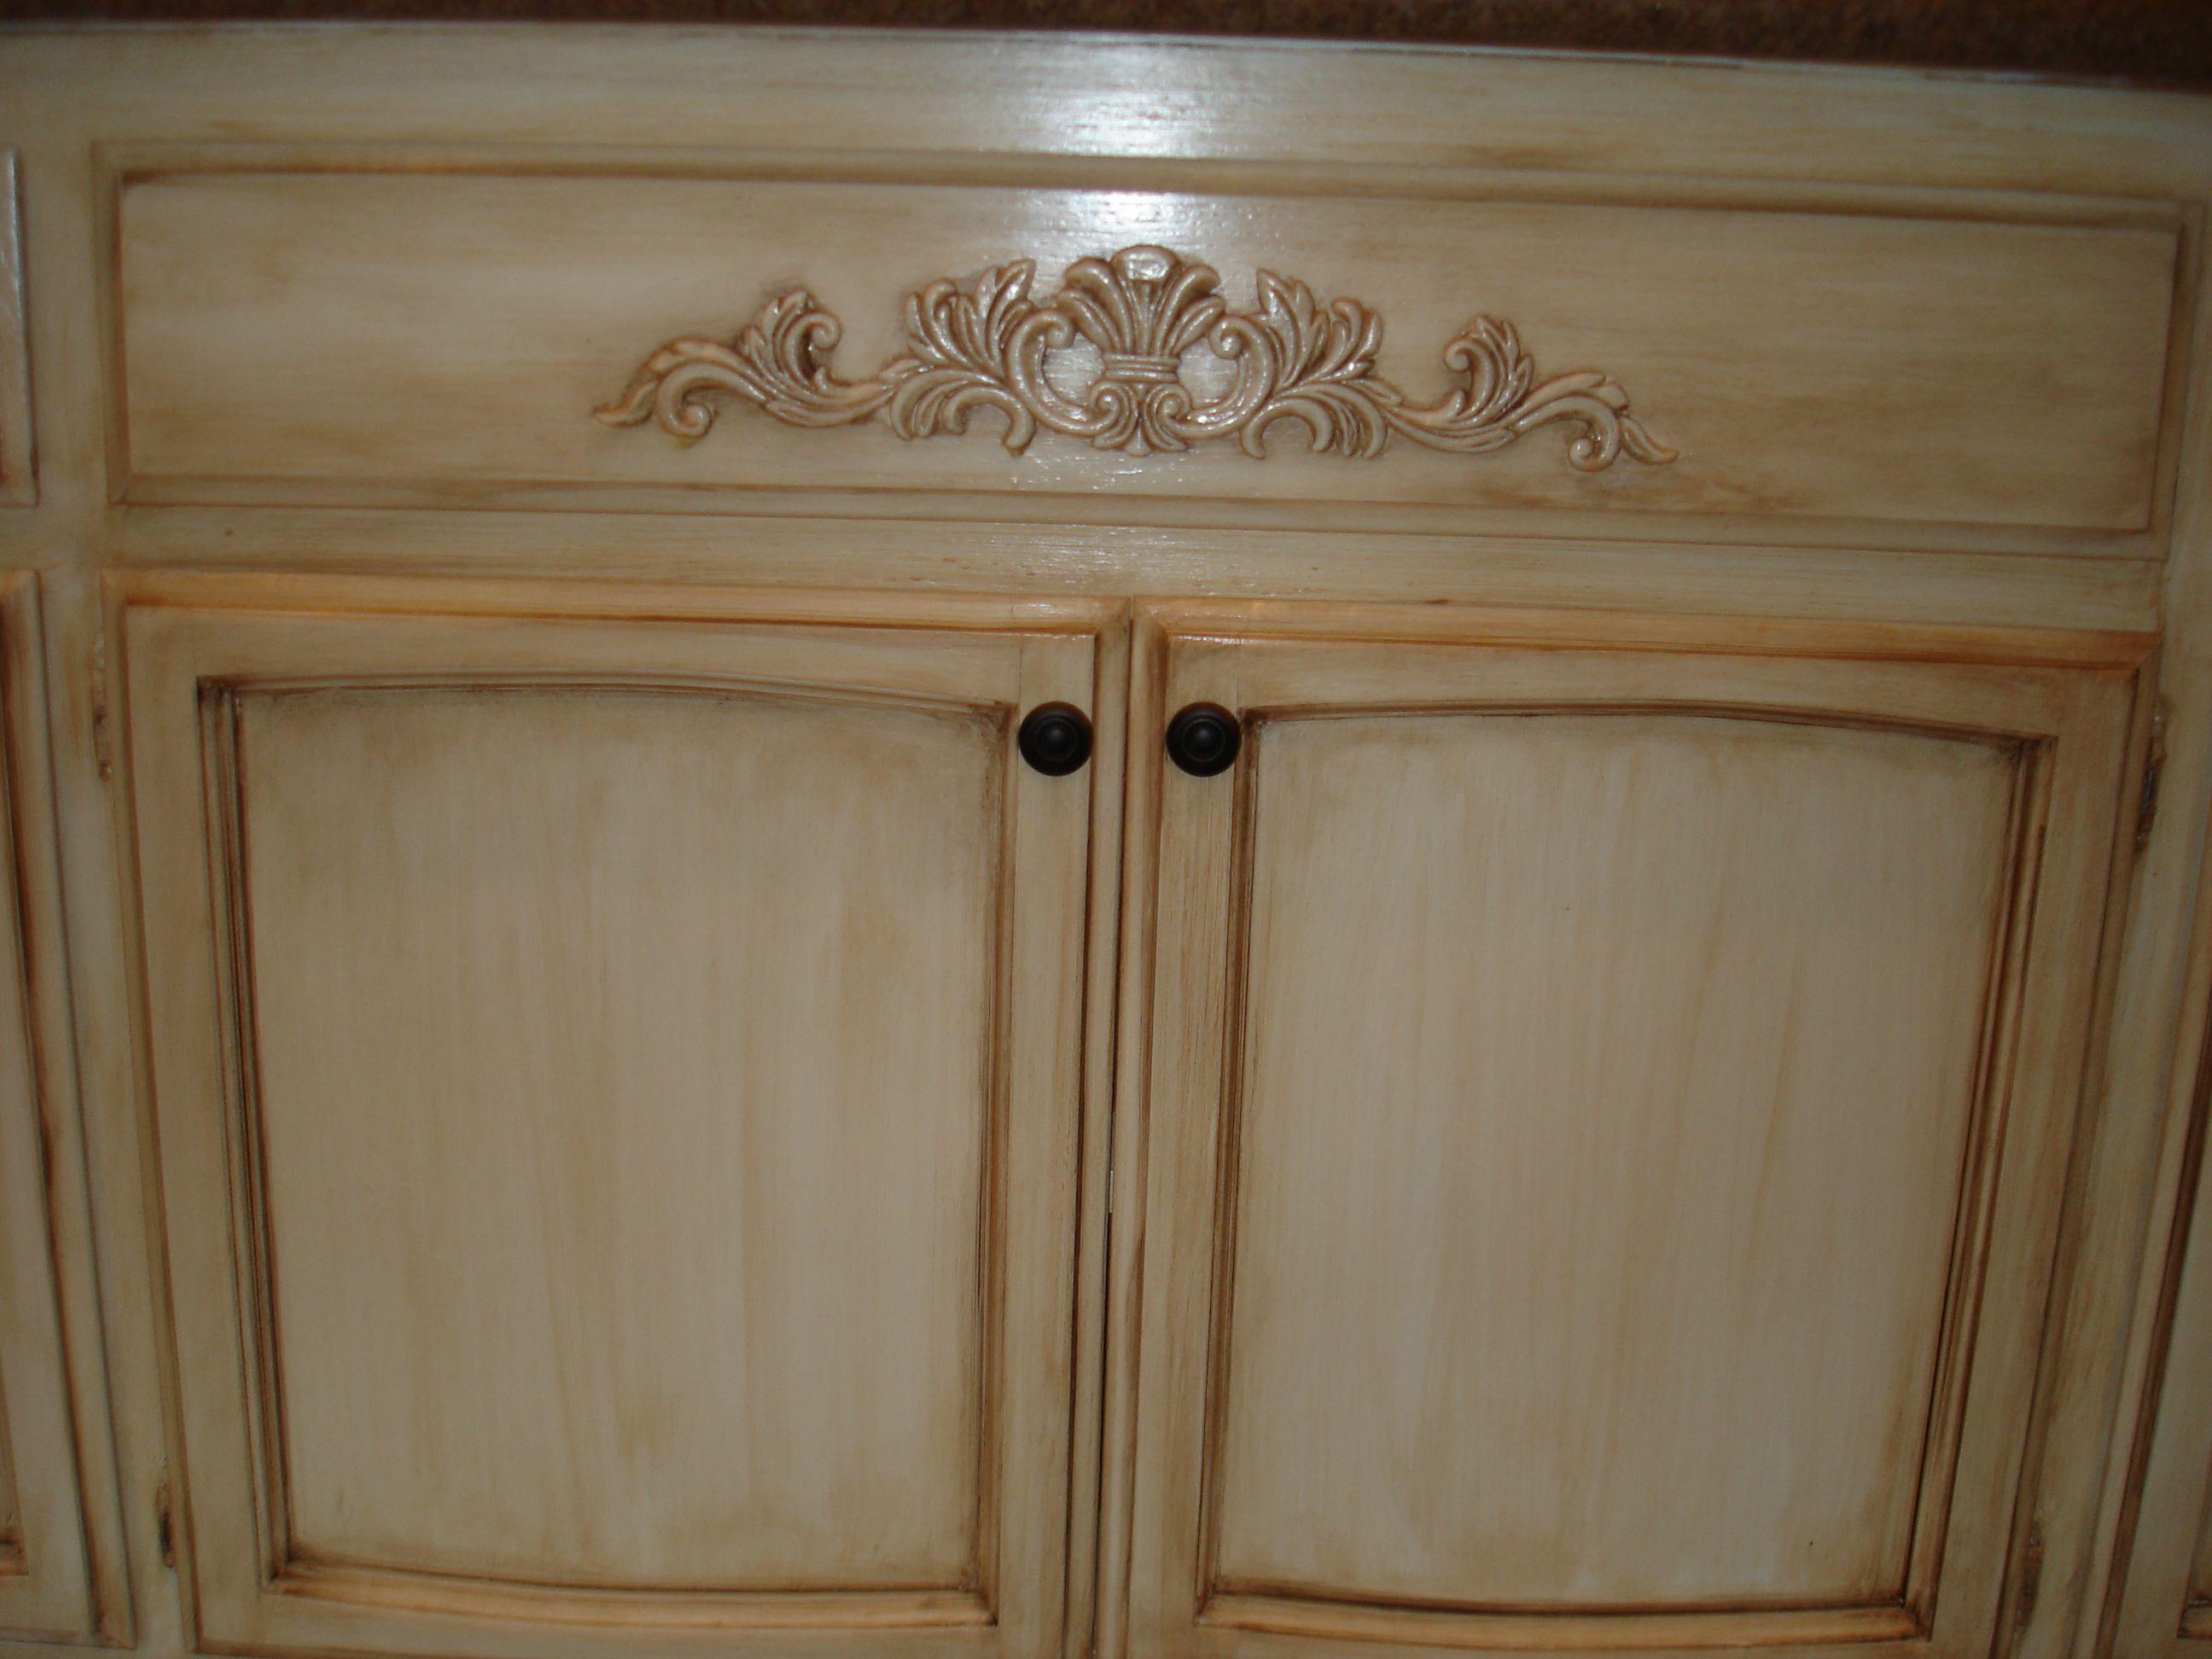 Off white cabinets with glaze glazed white cabinets for Photos of white glazed kitchen cabinets